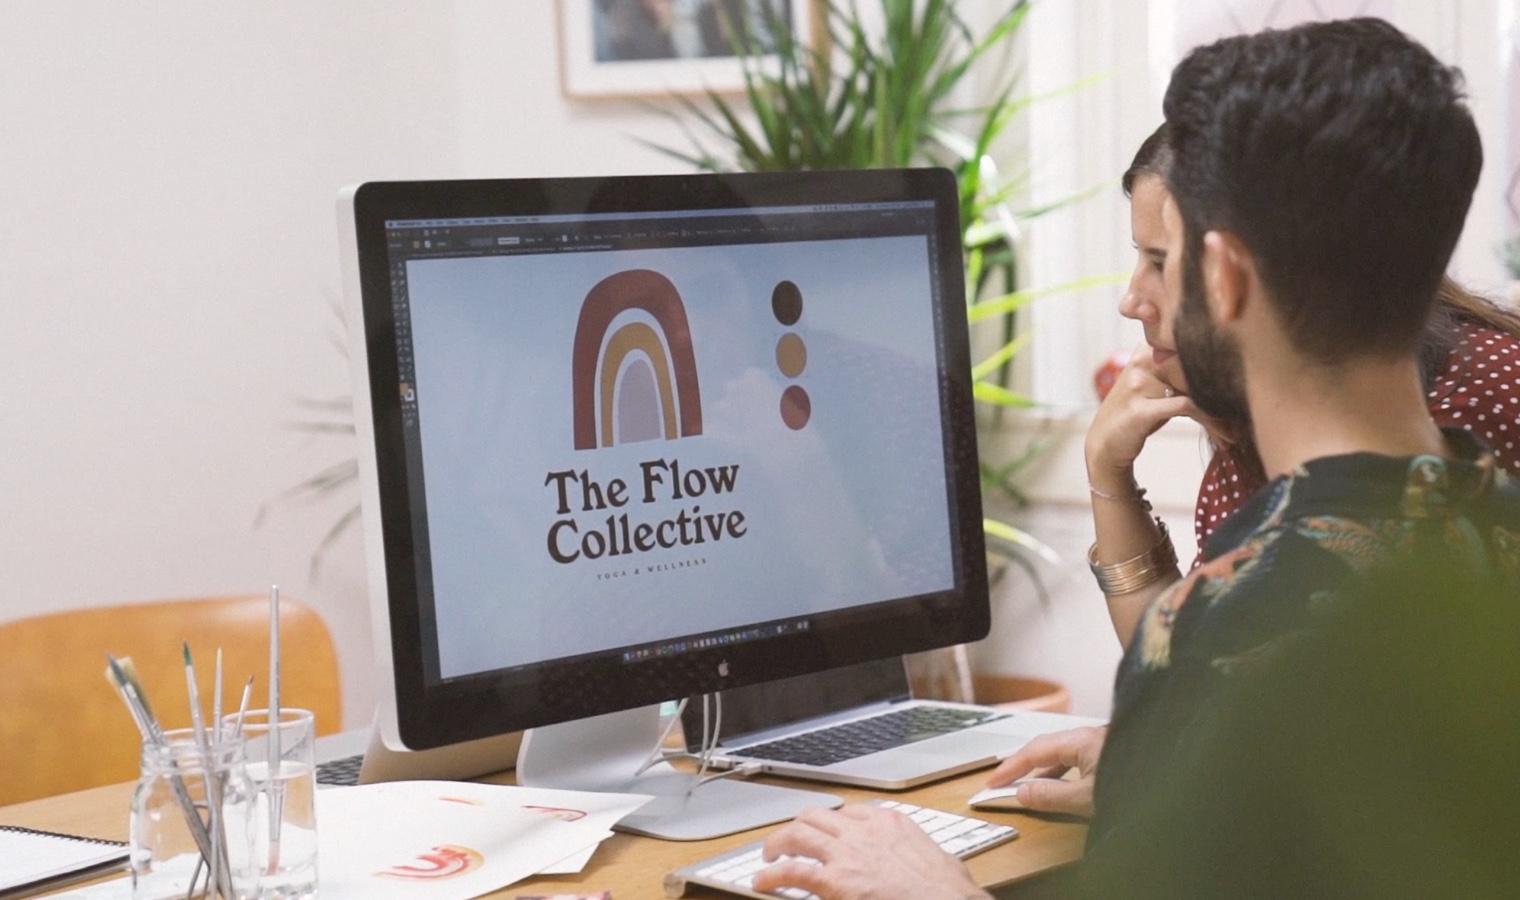 The-Flow-Collective-Yoga-Wellness-Meditation-Branding-07.jpg